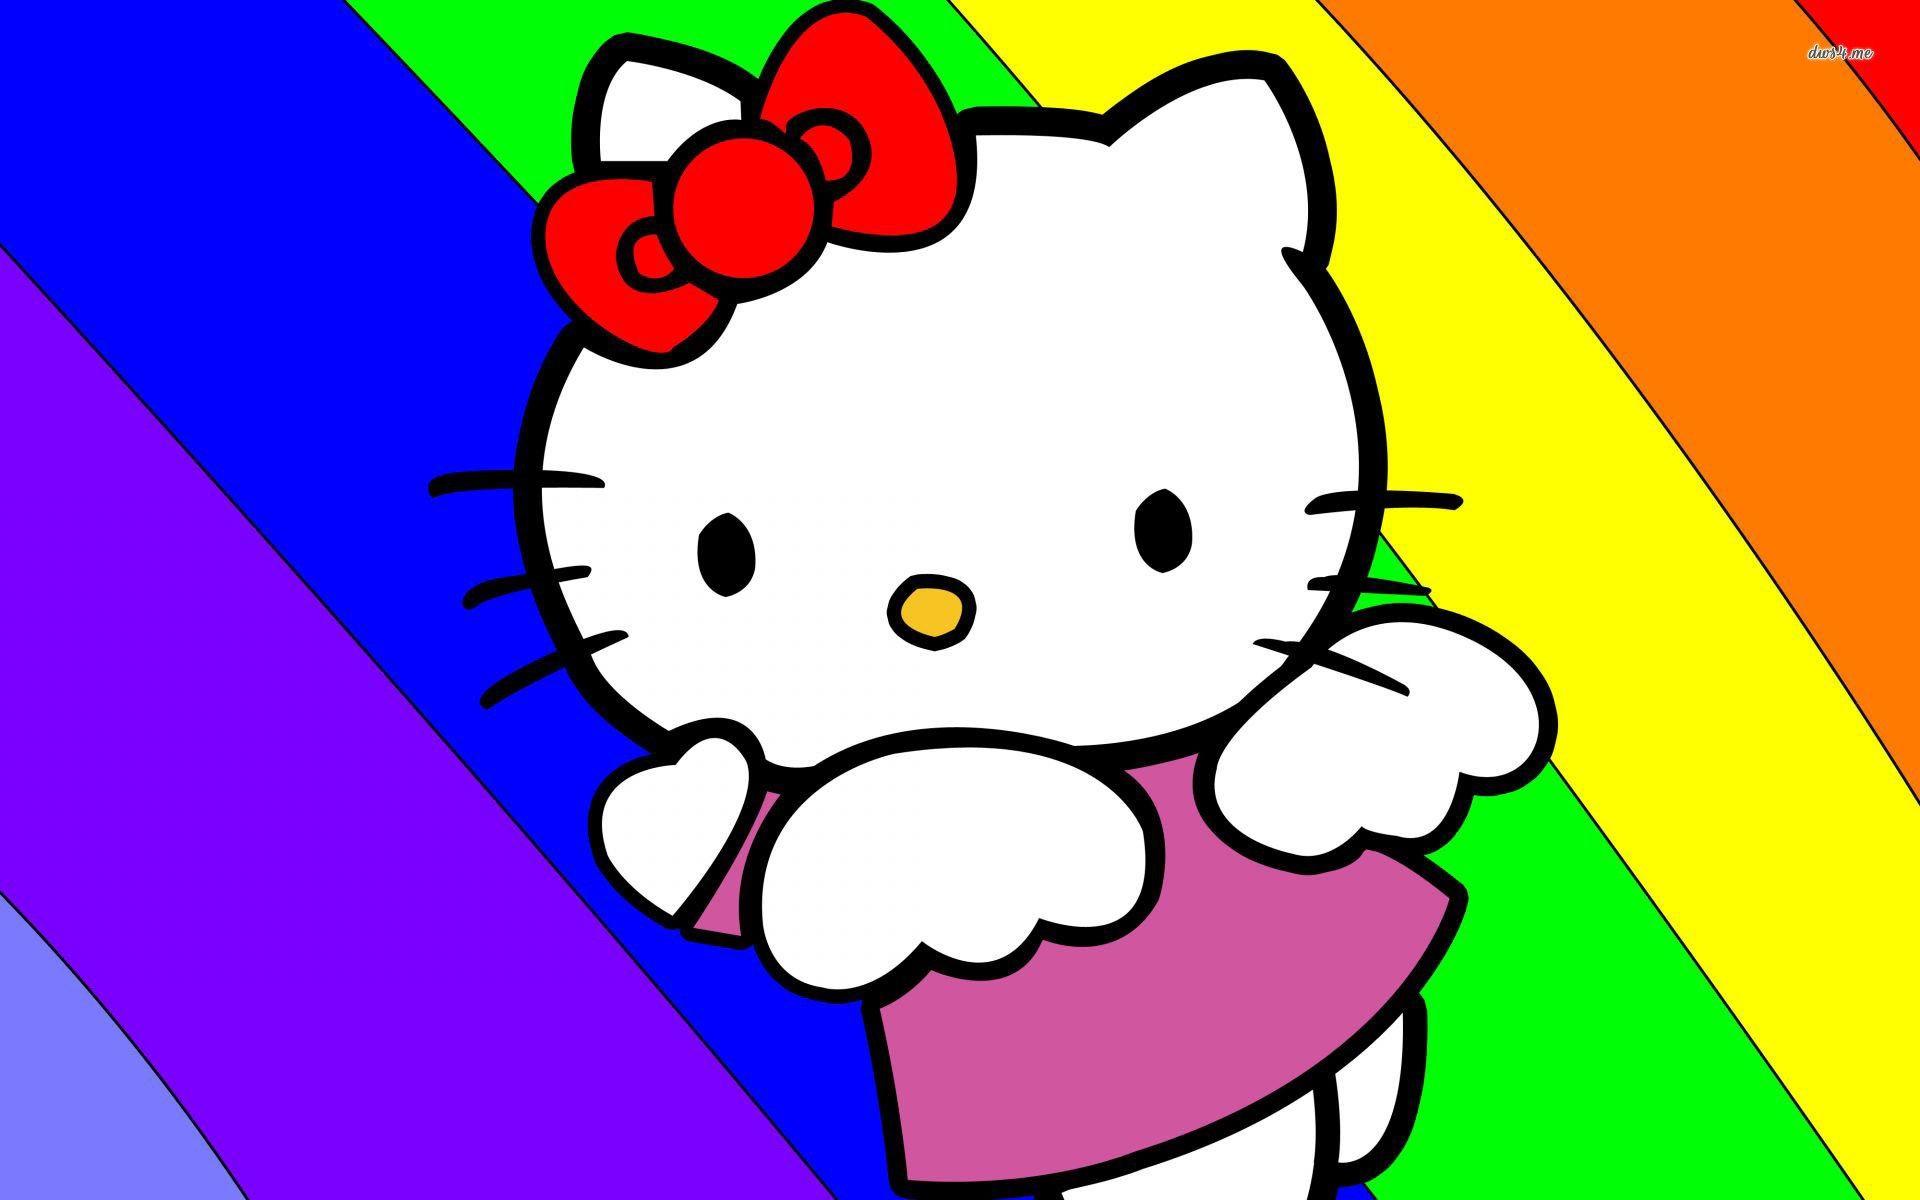 Download Wallpaper High Resolution Hello Kitty - a7154dce2368f098d590200e211a20ef  Snapshot_152118.jpg